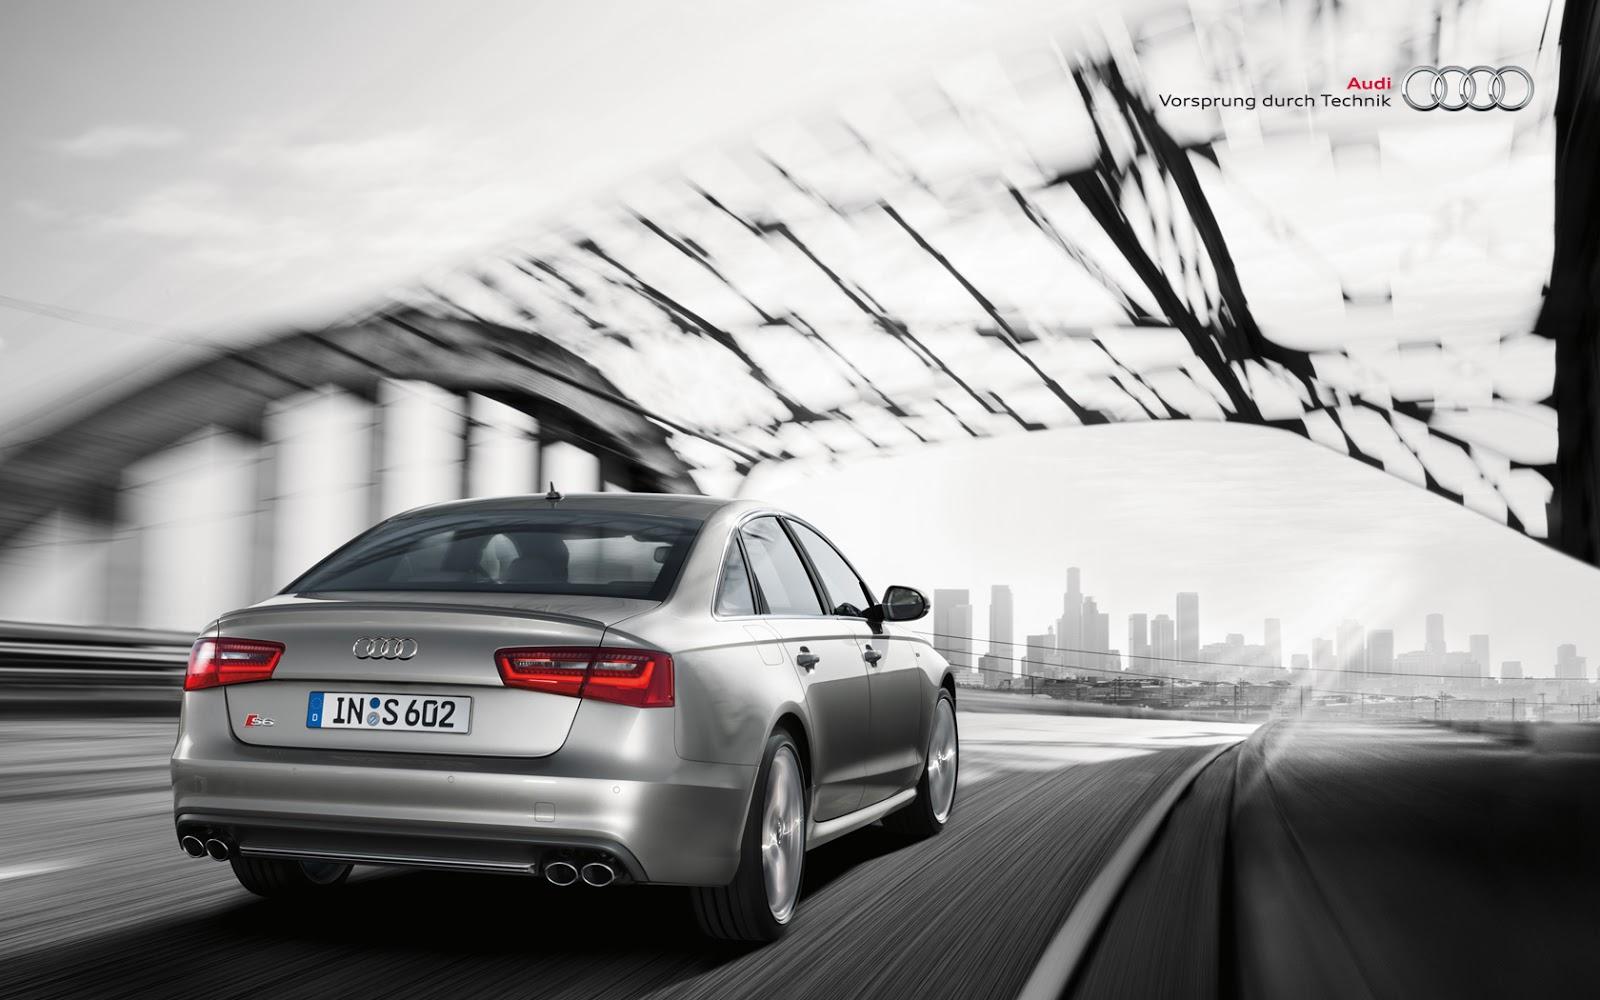 http://3.bp.blogspot.com/-cmsCIQ7nYQc/UKcUZ3zIP1I/AAAAAAAAI2U/7zSoJz0boL0/s1600/Audi-S6-A6-Exterior-rear-side-view-wallpaper.jpg